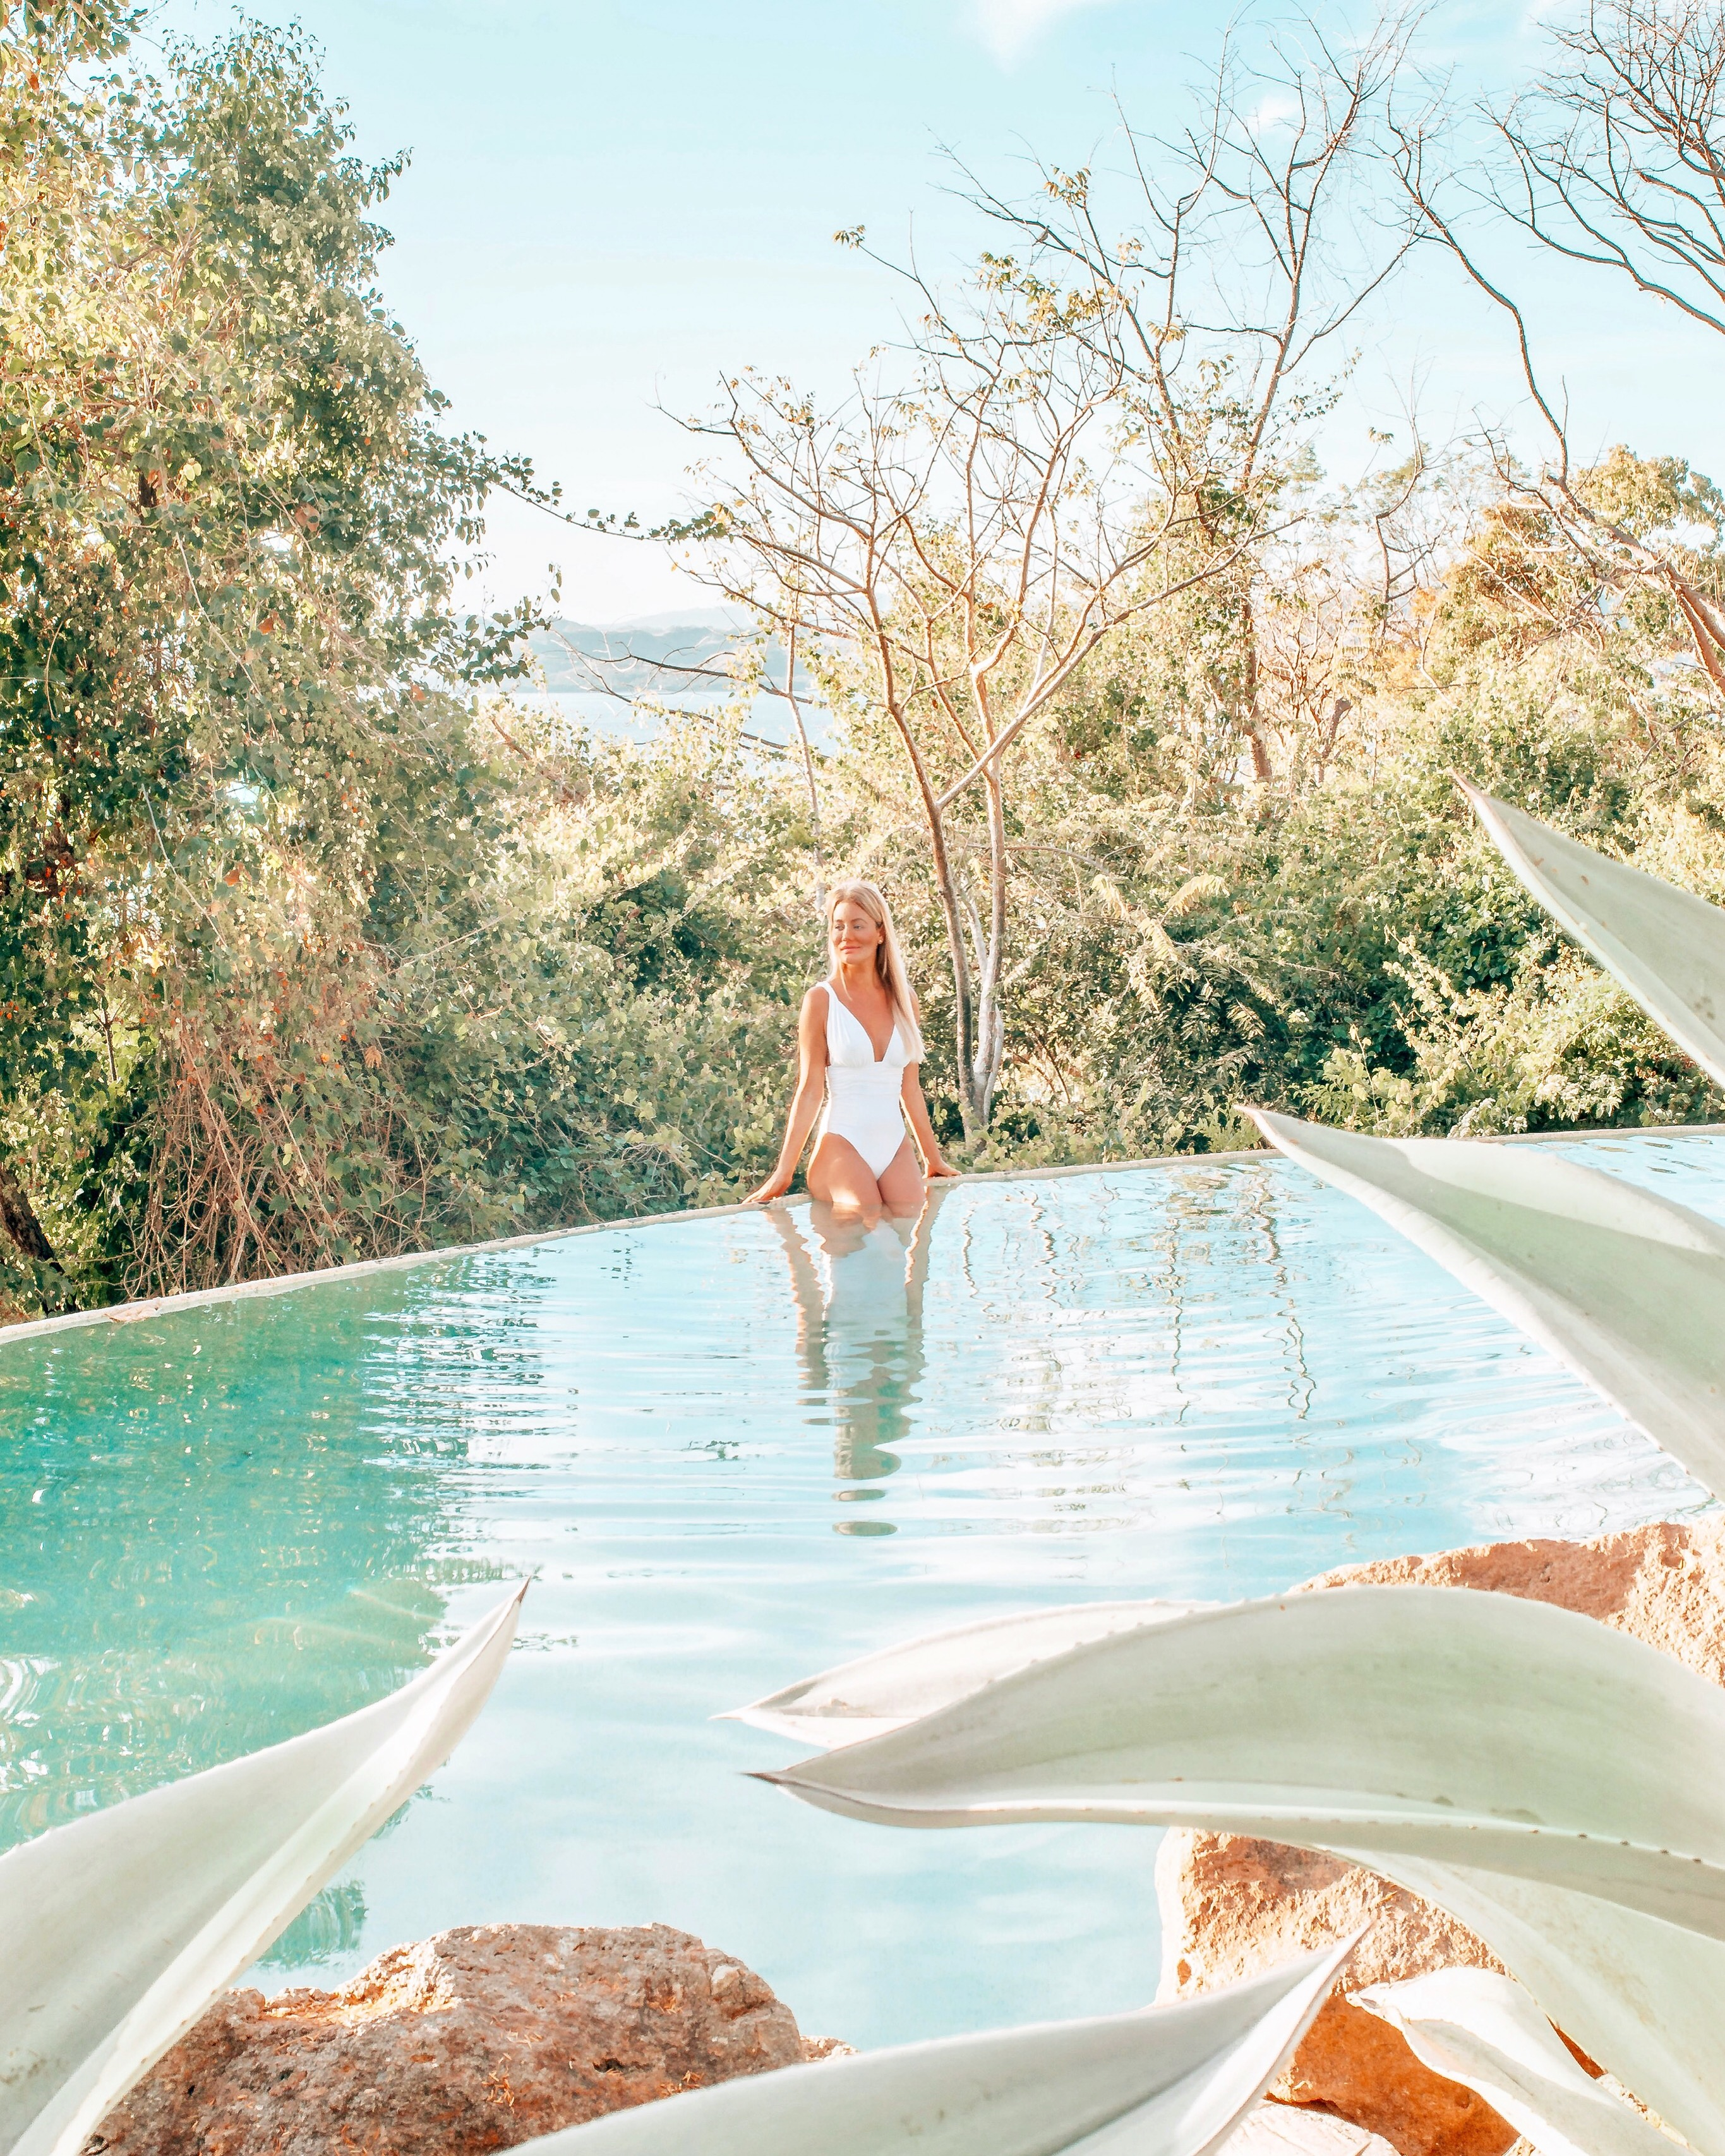 Andaz Costa Rica: Luxury Treehouse Resort in the Papagayo Peninsula